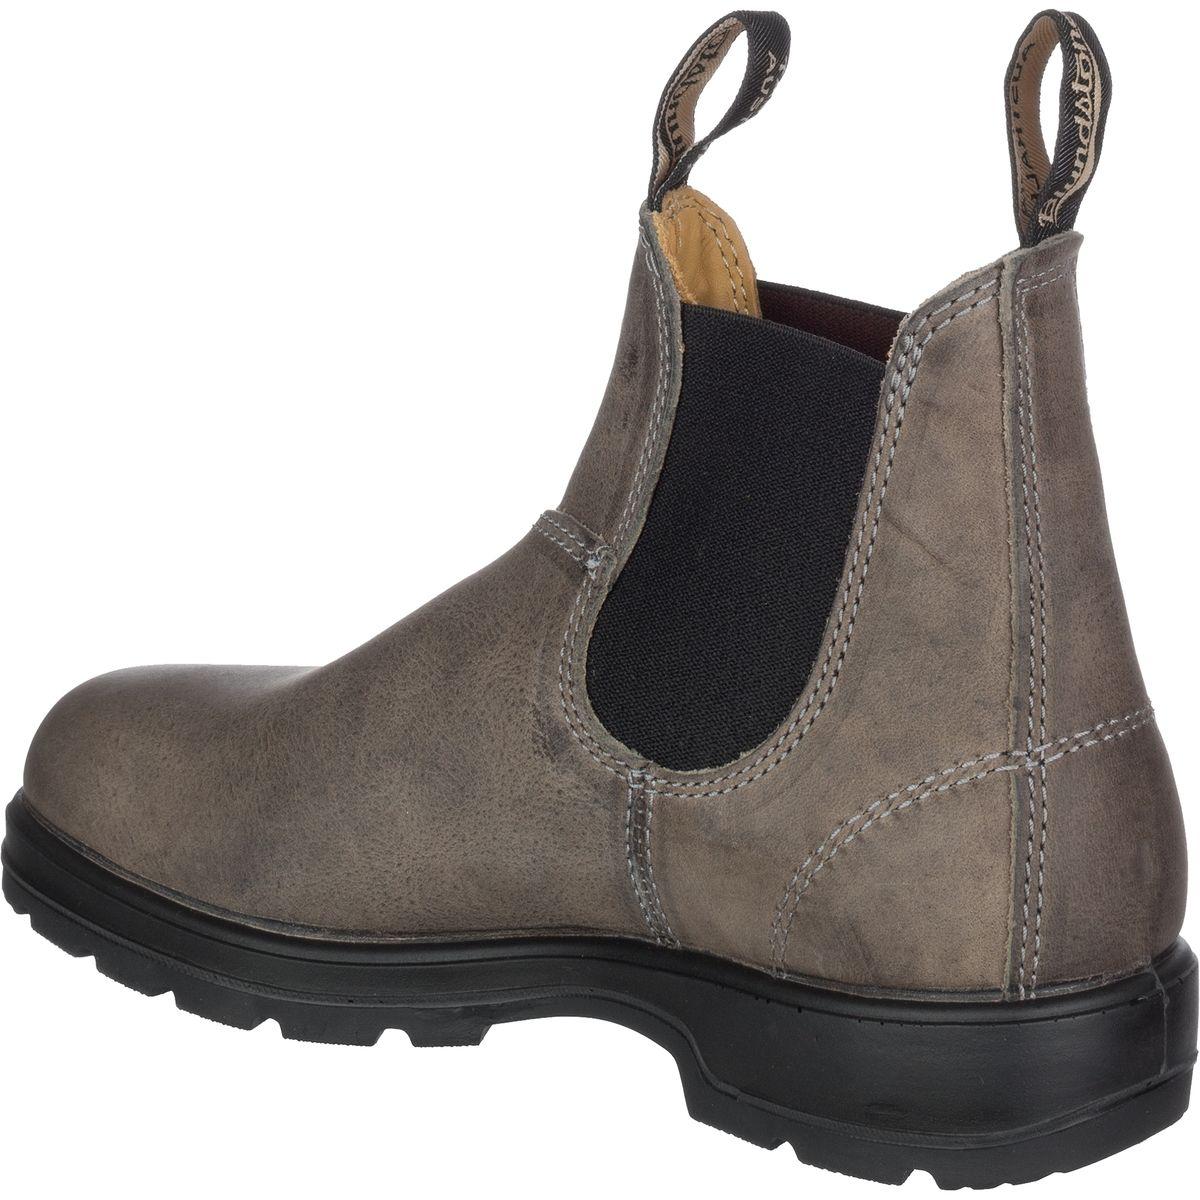 Blundstone-Super-550-Series-Boot-Women-039-s thumbnail 17